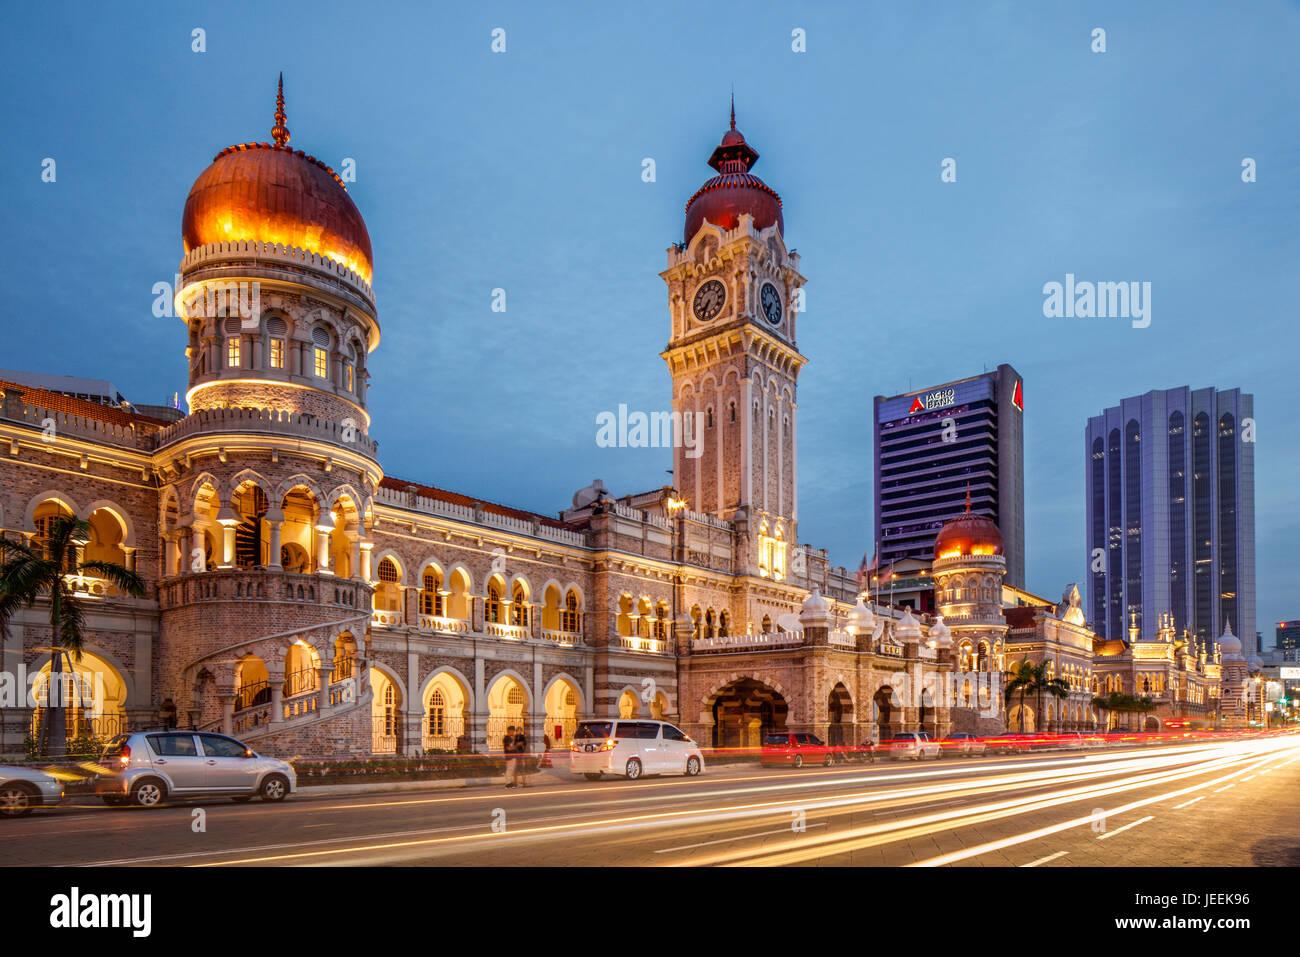 Le Sultan Abdul Samad Building, Kuala Lumpur, Malaisie. Photo Stock